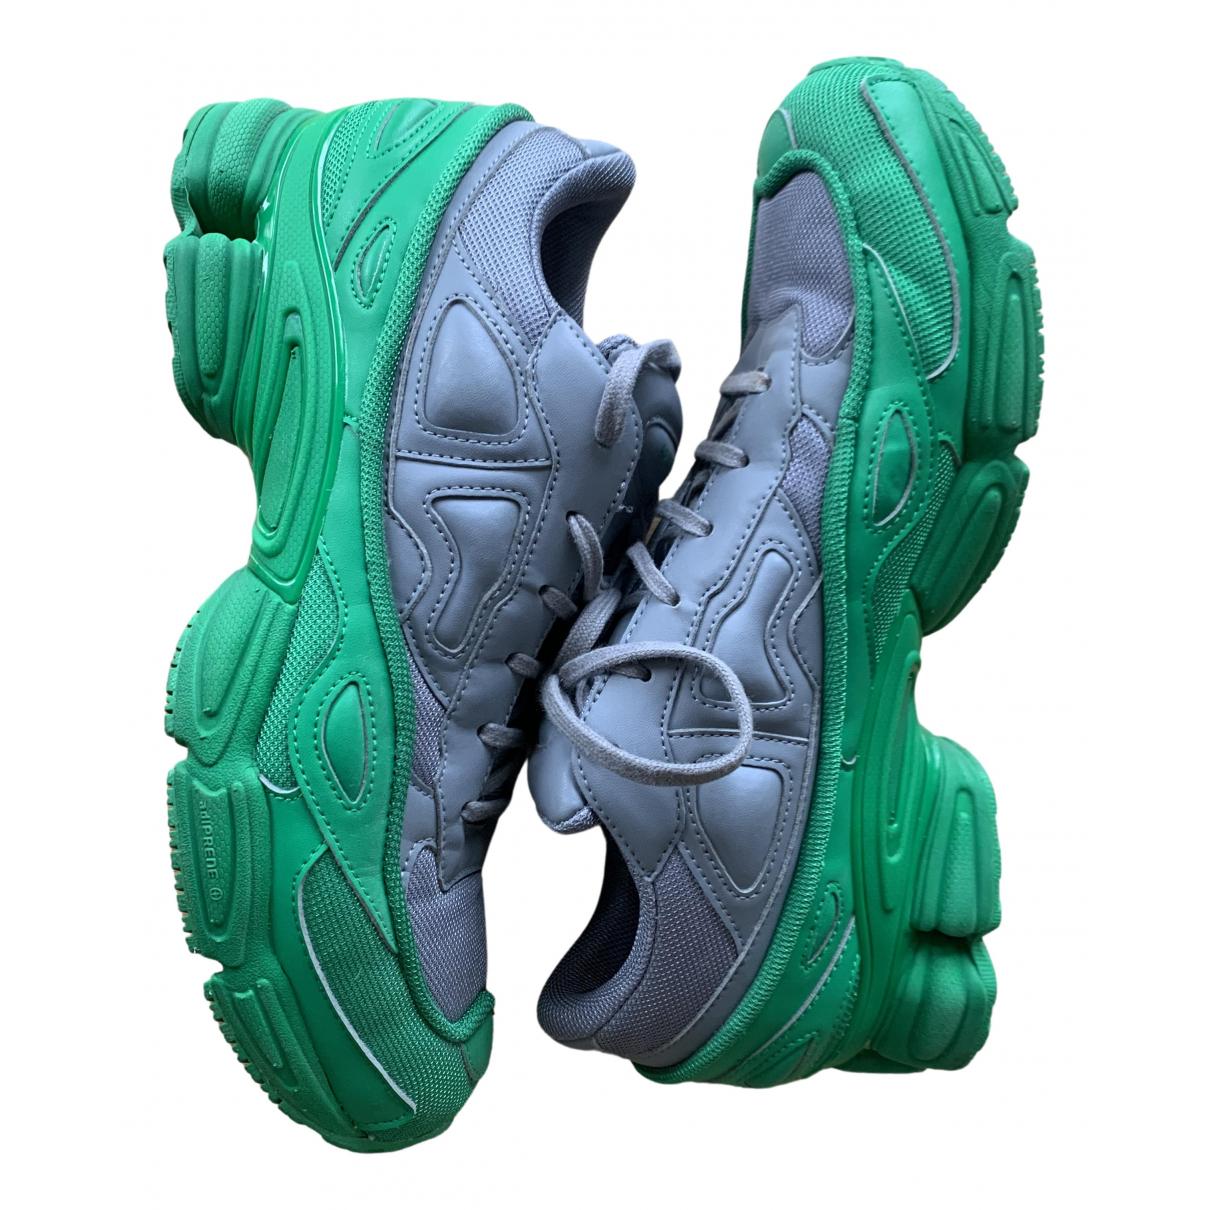 Adidas X Raf Simons - Baskets RS Ozweego pour homme en cuir verni - vert